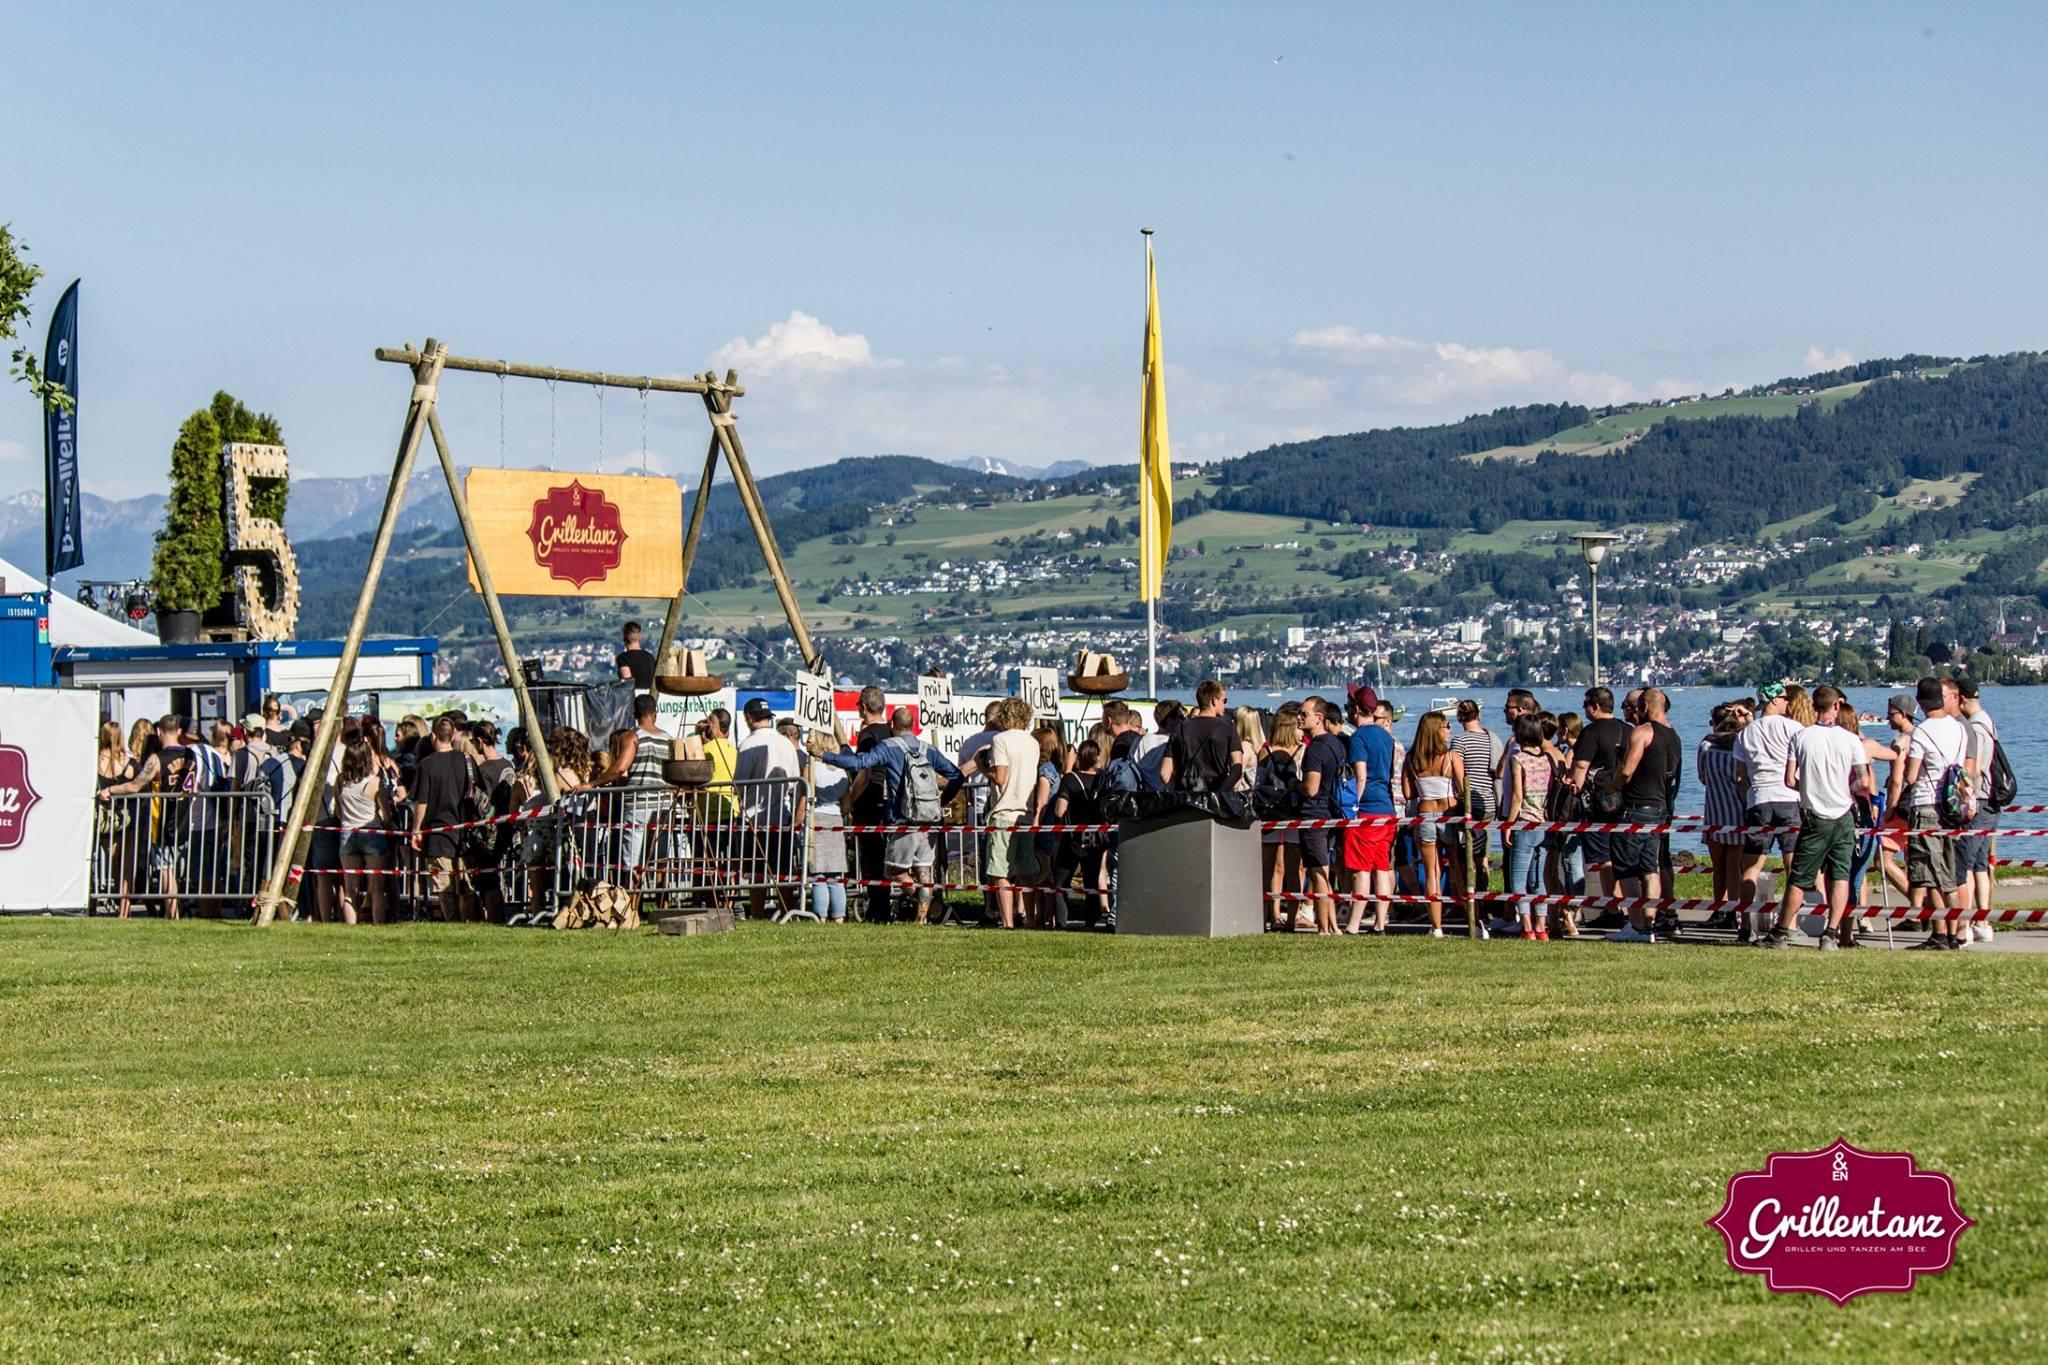 Grillentanz Festival 2018